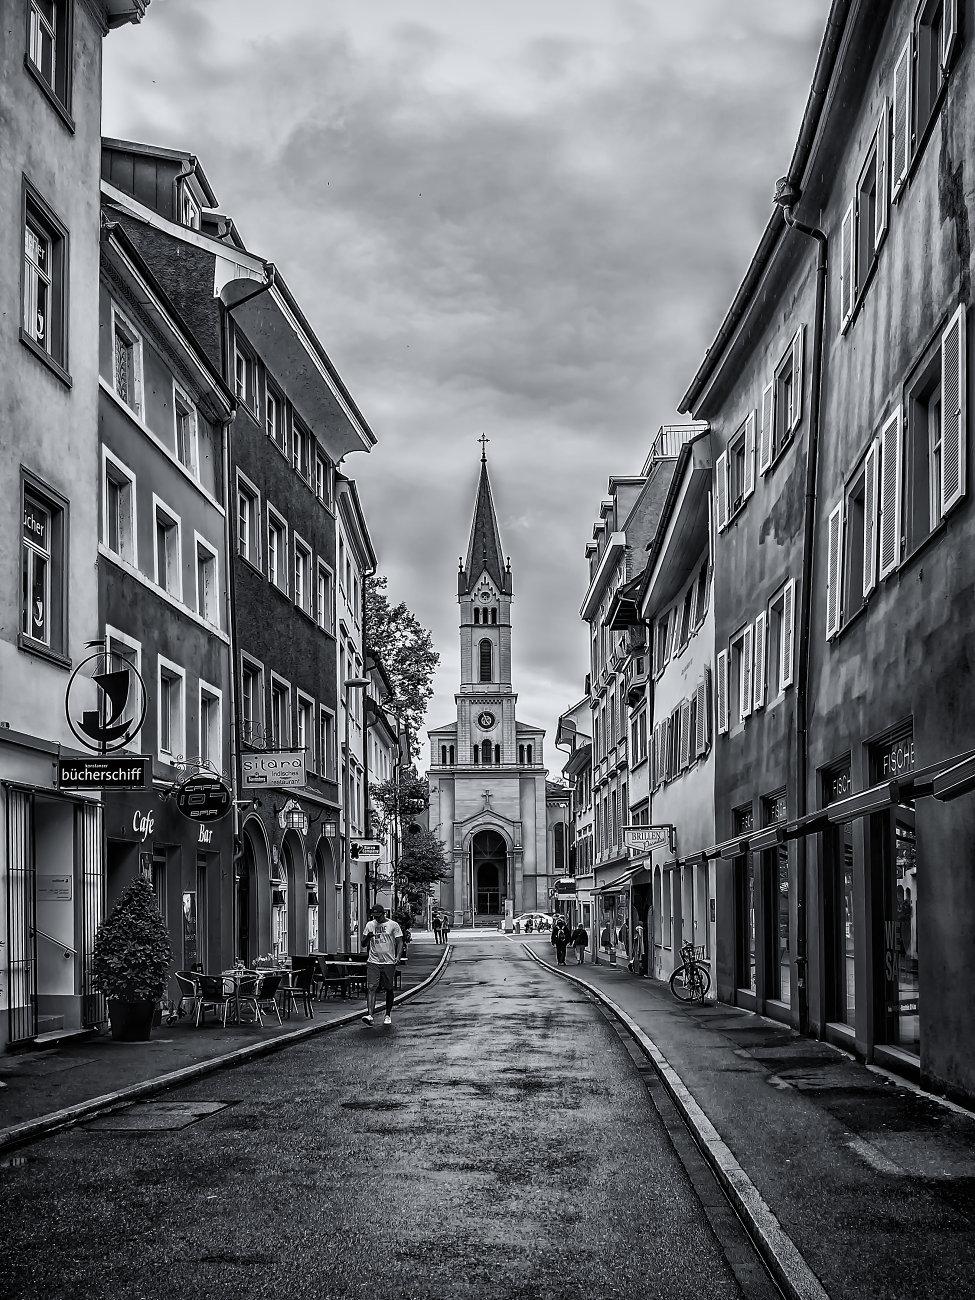 Paradiesstrasse